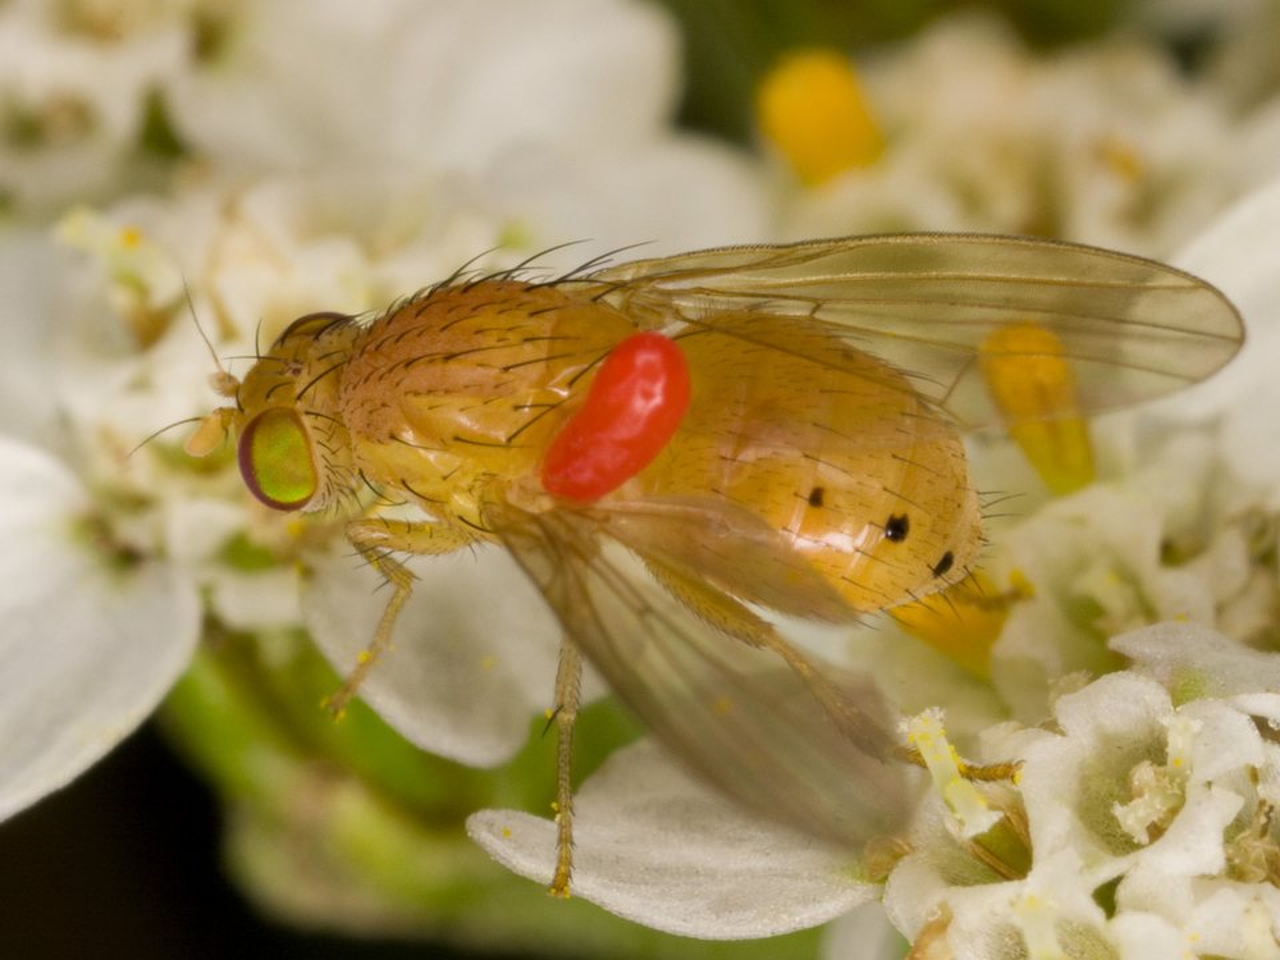 Diptera-3717.jpg